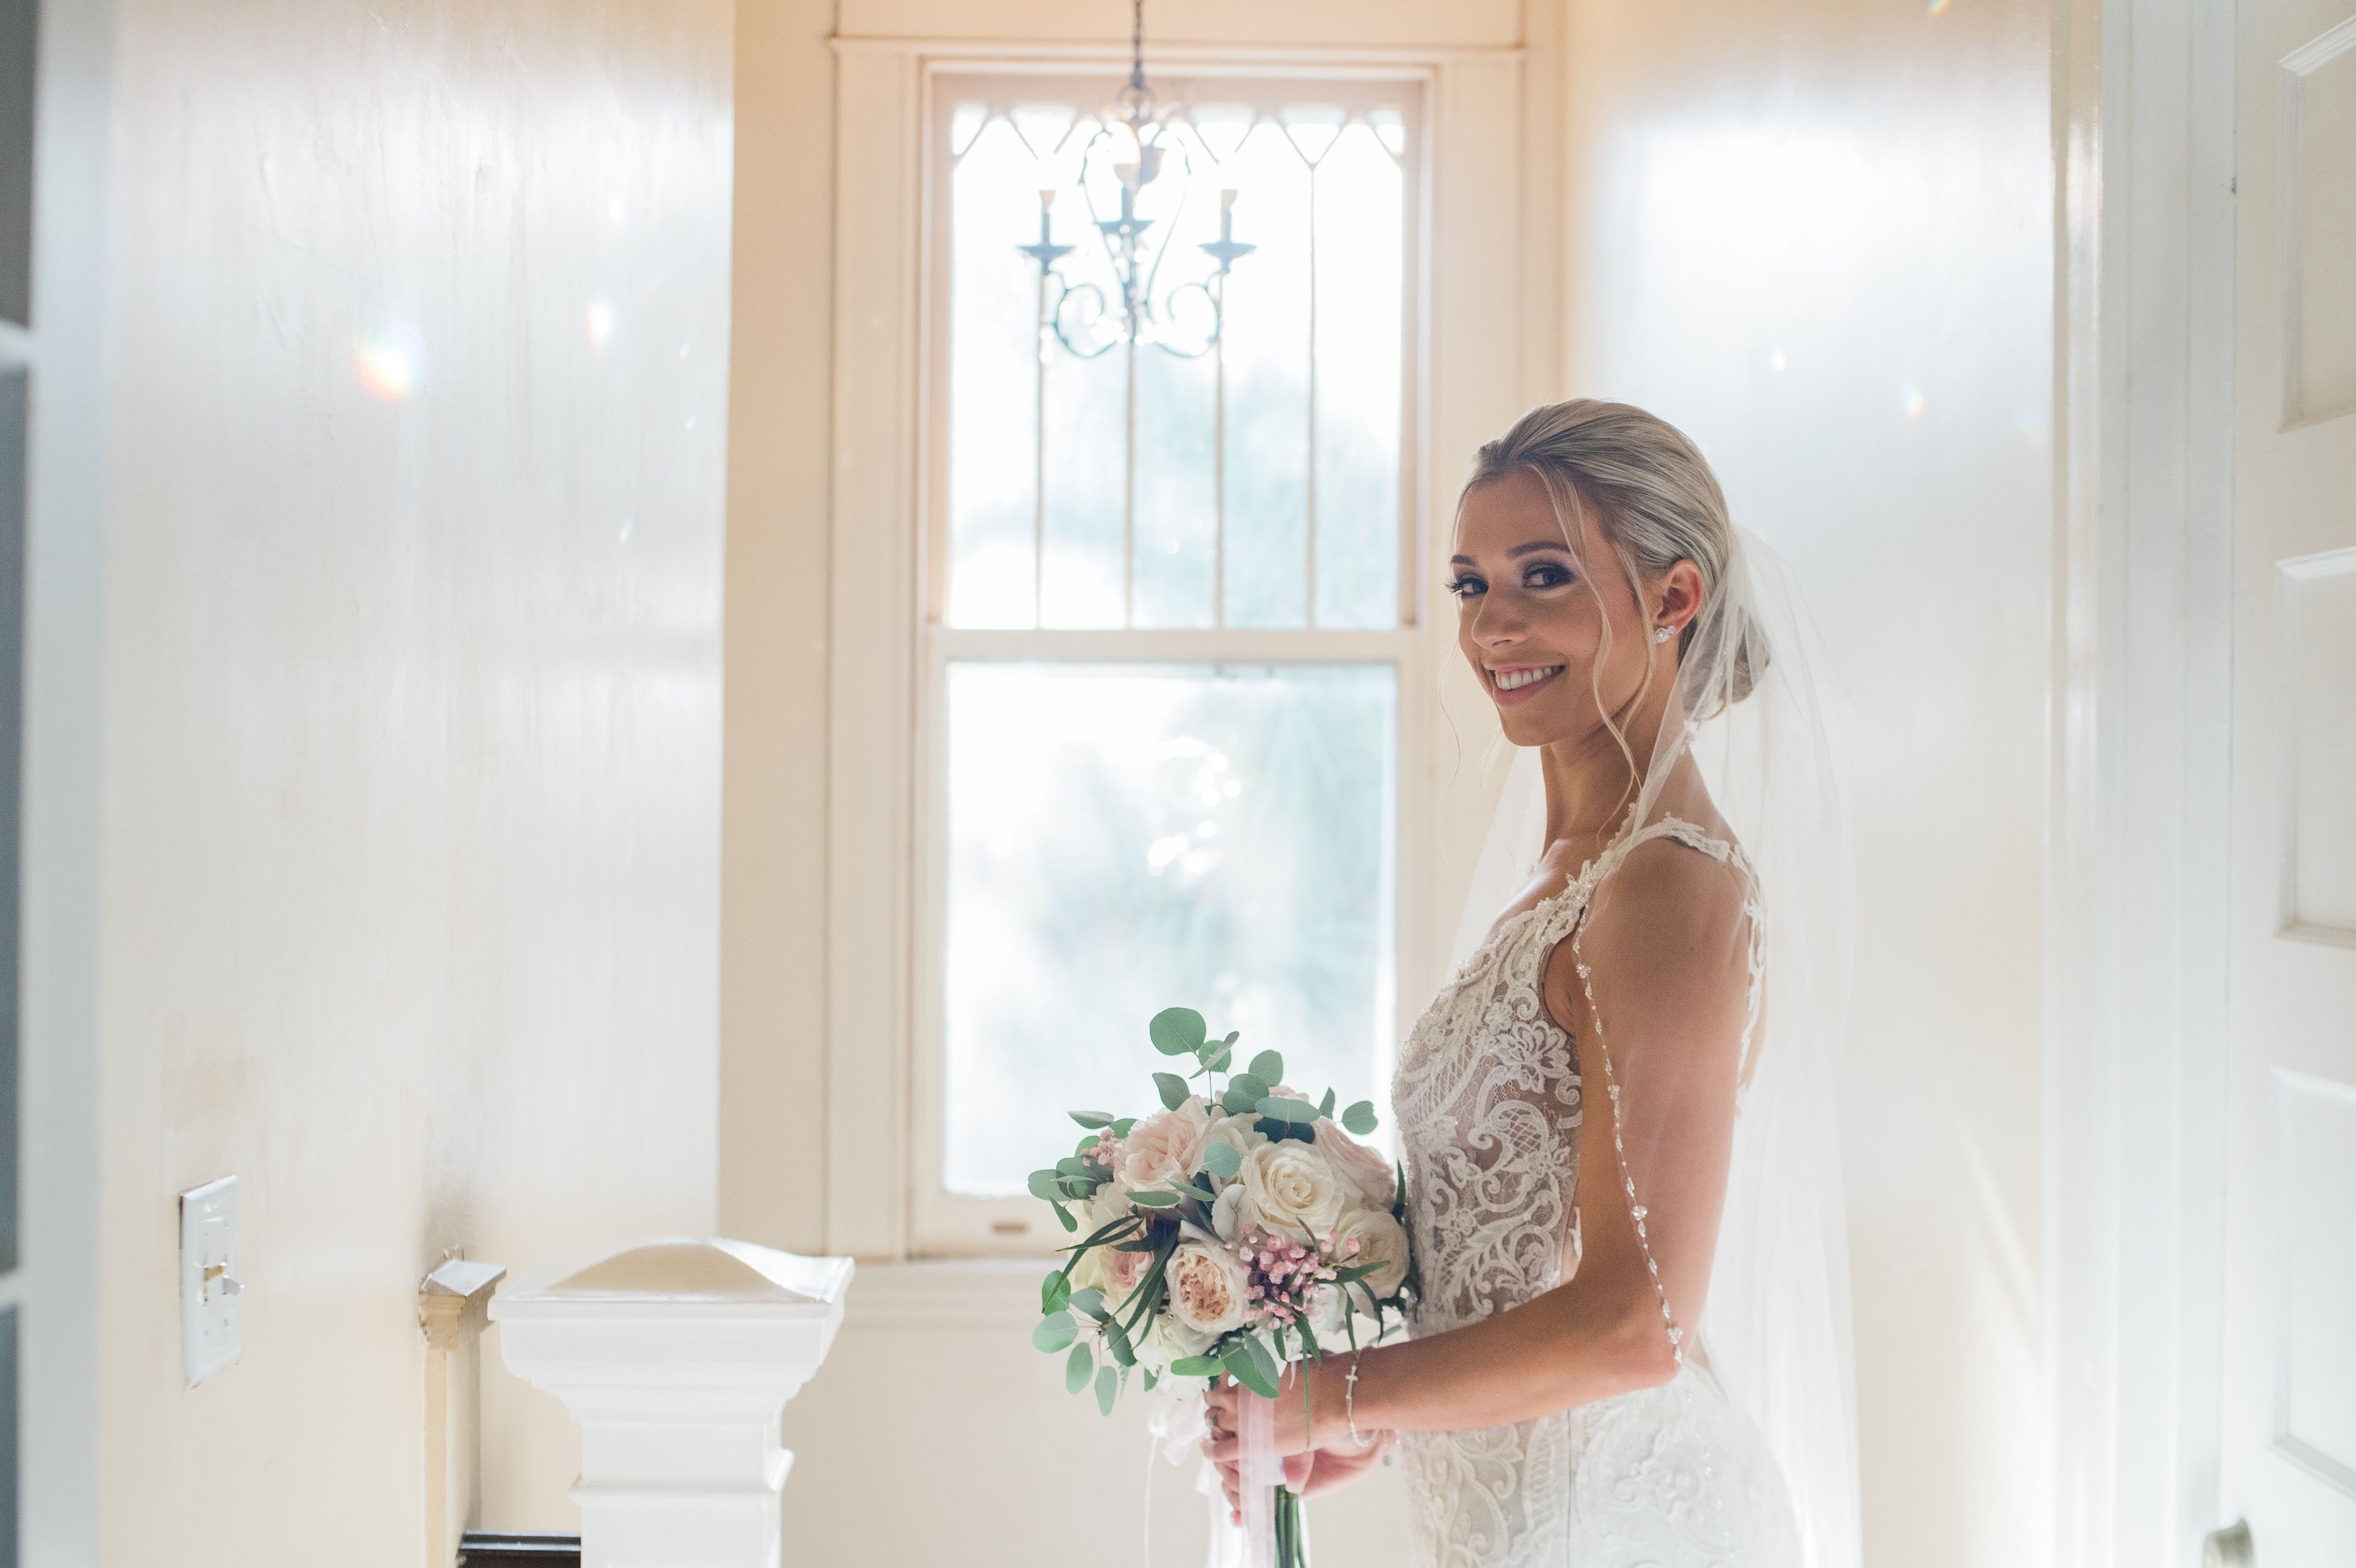 Complete Weddings + Events - Oakland Park, FL 33309 - (954)499-8099 | ShowMeLocal.com